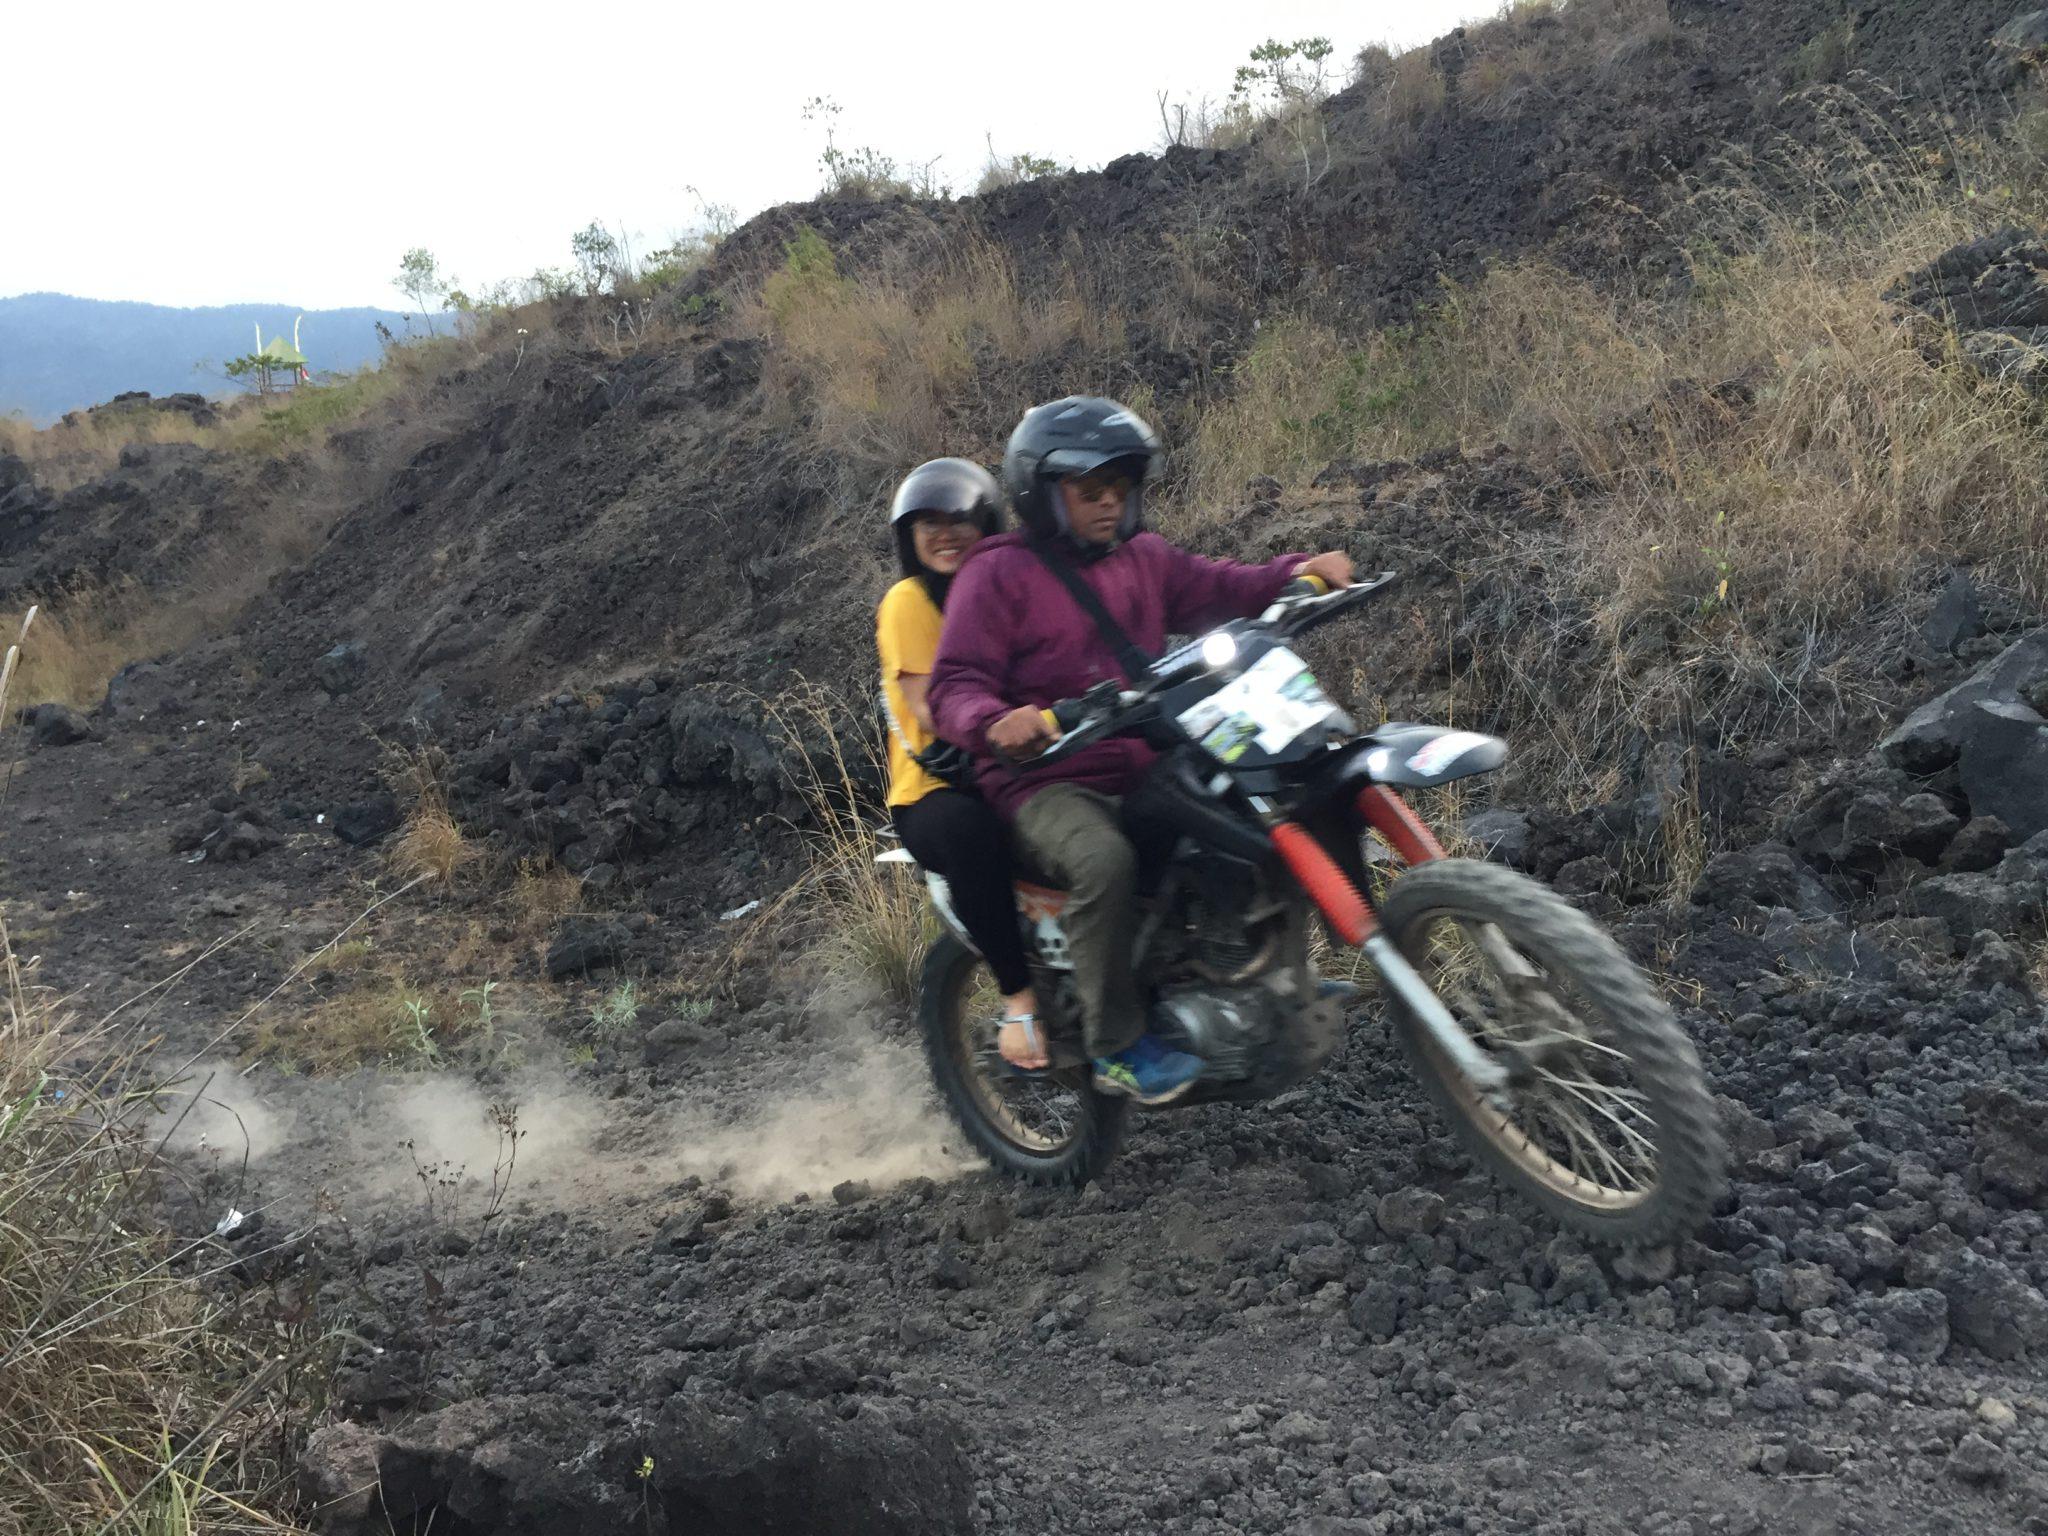 Mount Batur Volcano Ryders MX Tour: Bali Trail Bike Adventure